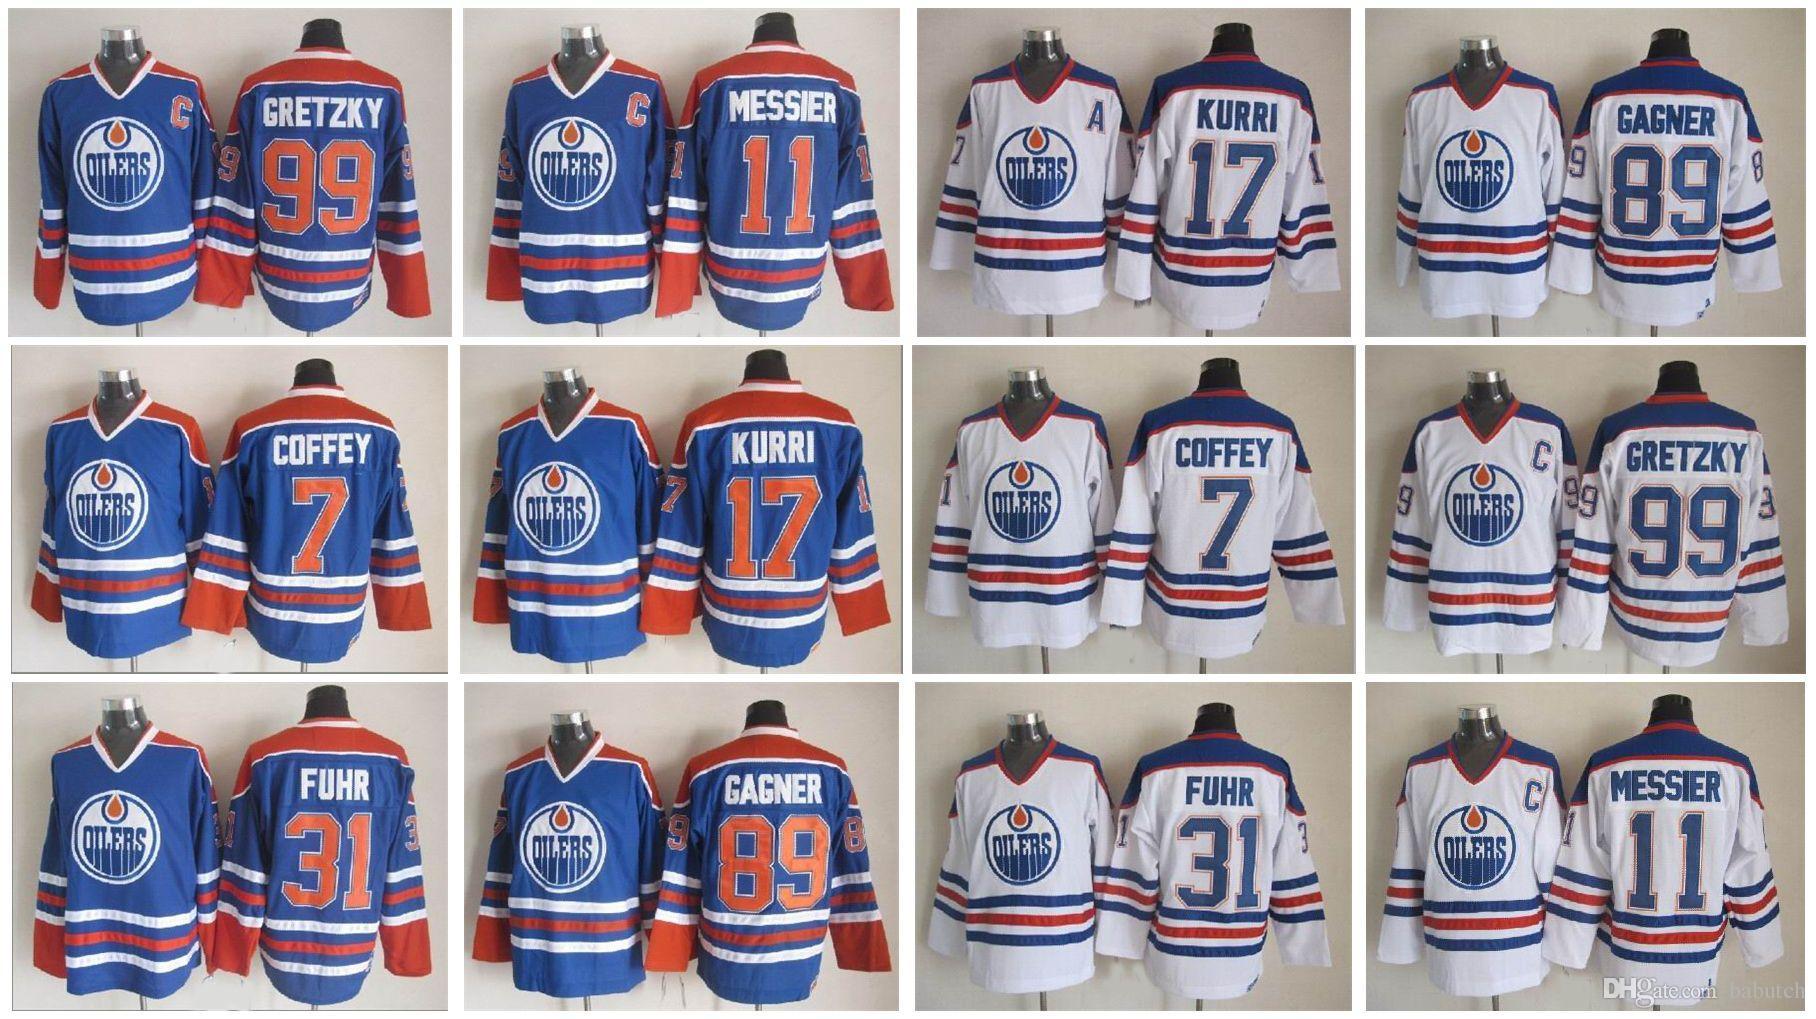 Edmonton Oilers Hockey Jerseys Sam Gagner 7 Paul Coffey 11 Mark Messier 17  Jari Kurri 31 Grant Fuhr 30 Bill Ranfrd Vintage Jerseys Detroit Red Wings  Gordie ... ed7ab3076